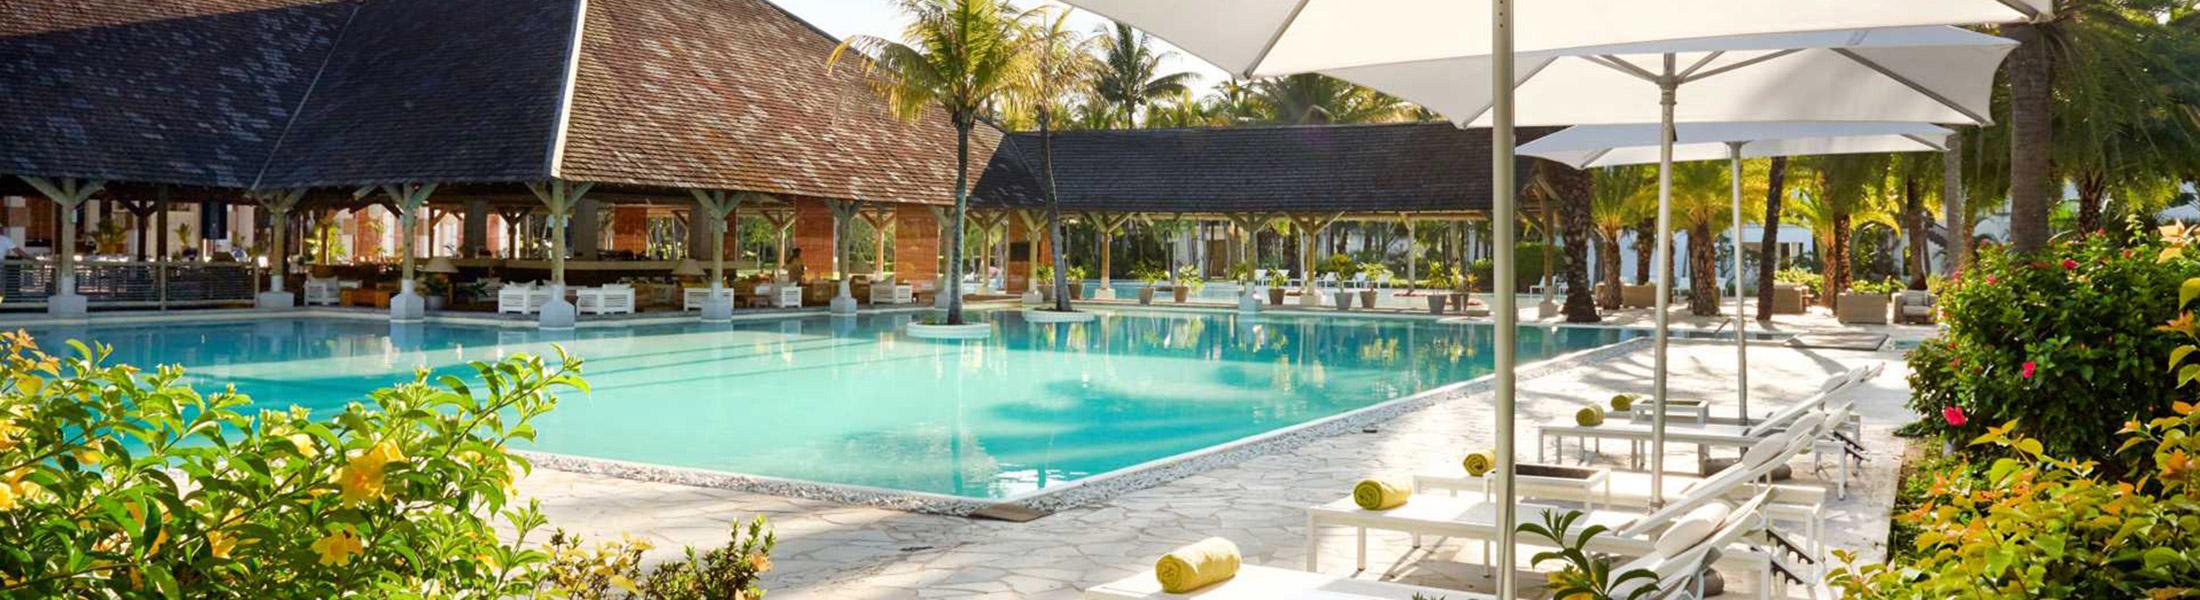 Pool & Loungers at Ravenala Attitude in Mauritius